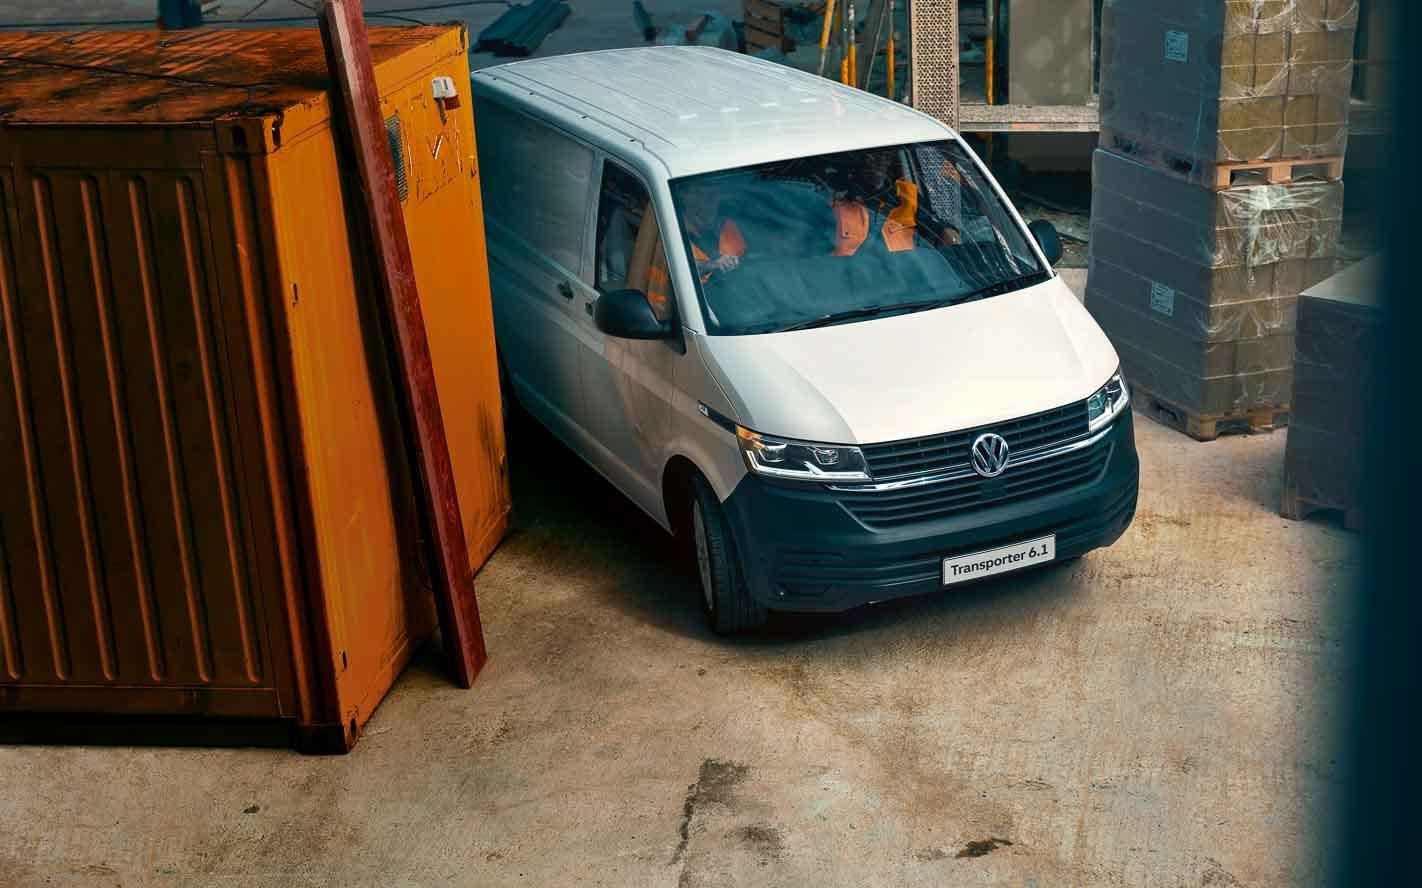 2021 Volkswagen T6.1 Transporter, Caravelle, Multivan ...